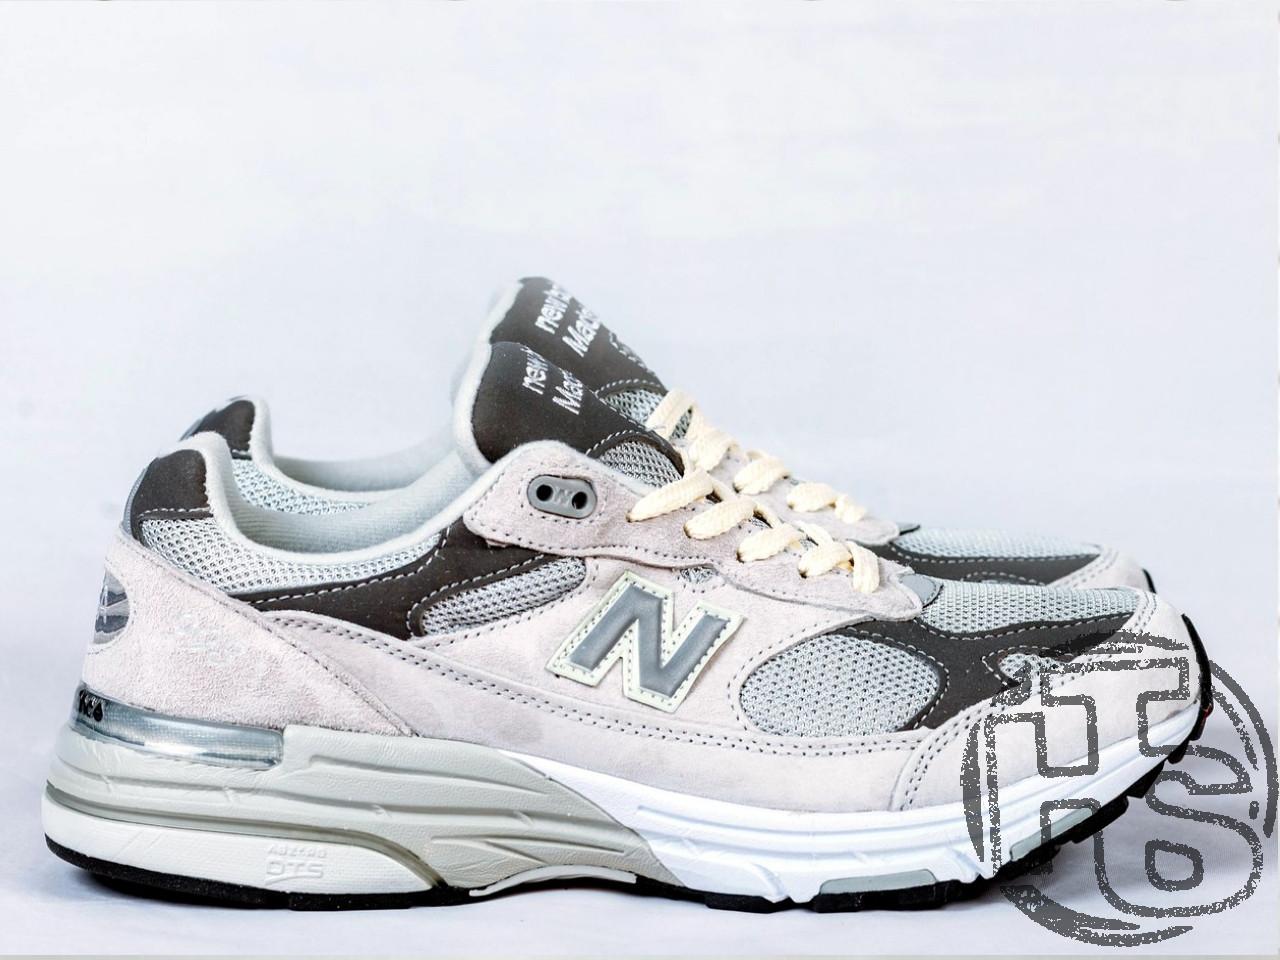 online store fc723 6cd11 Мужские кроссовки New Balance 993 USA Grey WR993GL. Любимые кроссовки  Джобса - Bigl.ua